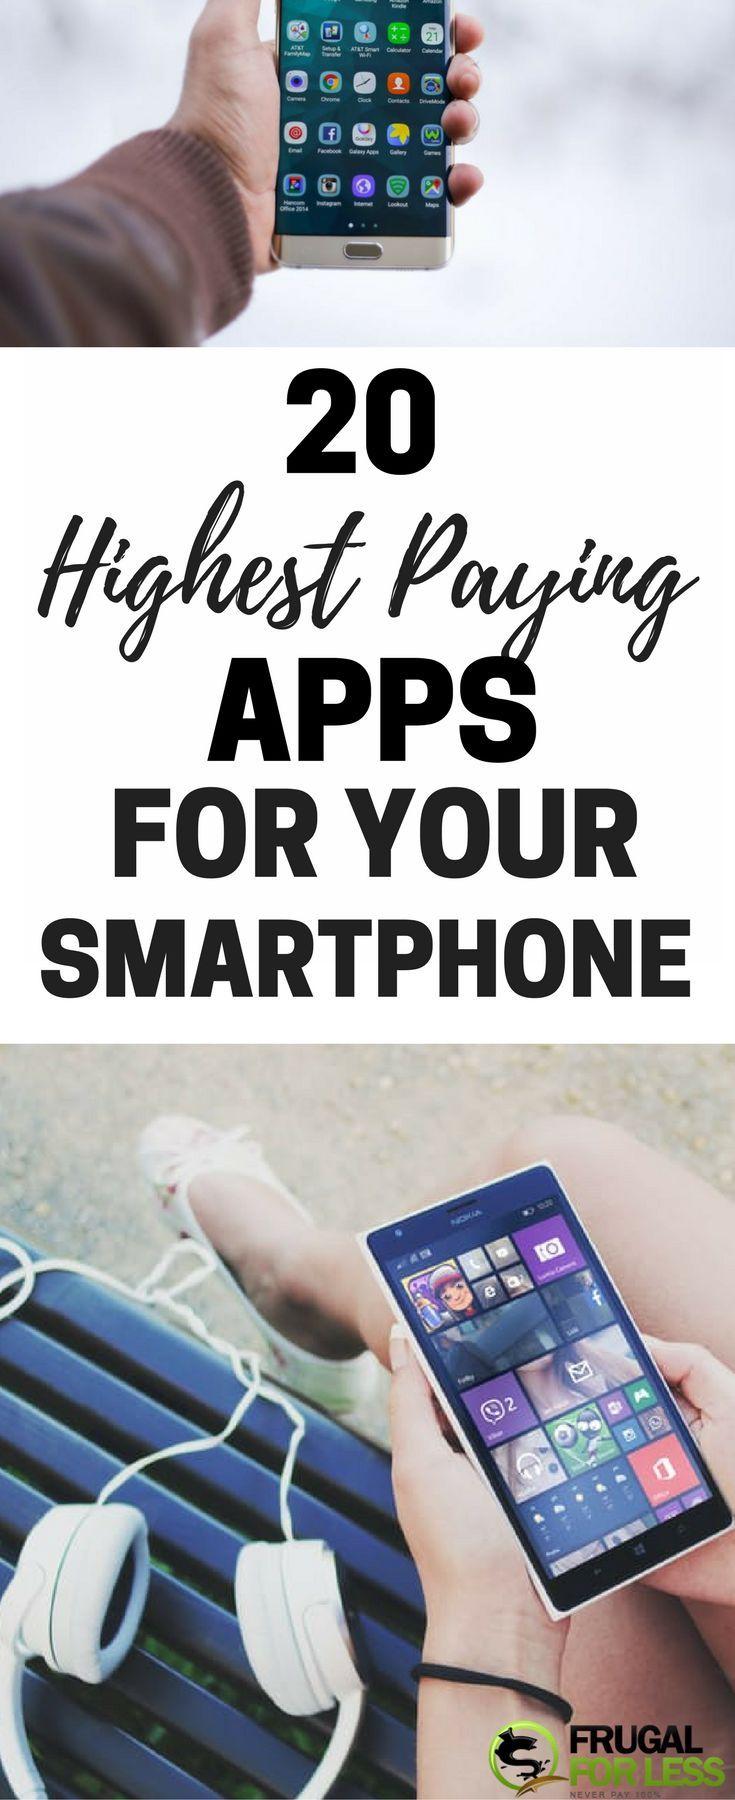 Make Money From Home | Make Money Online | Highest Paying Apps | Surveys For Money | Money Making Apps #moneymakingapps #frugal #money